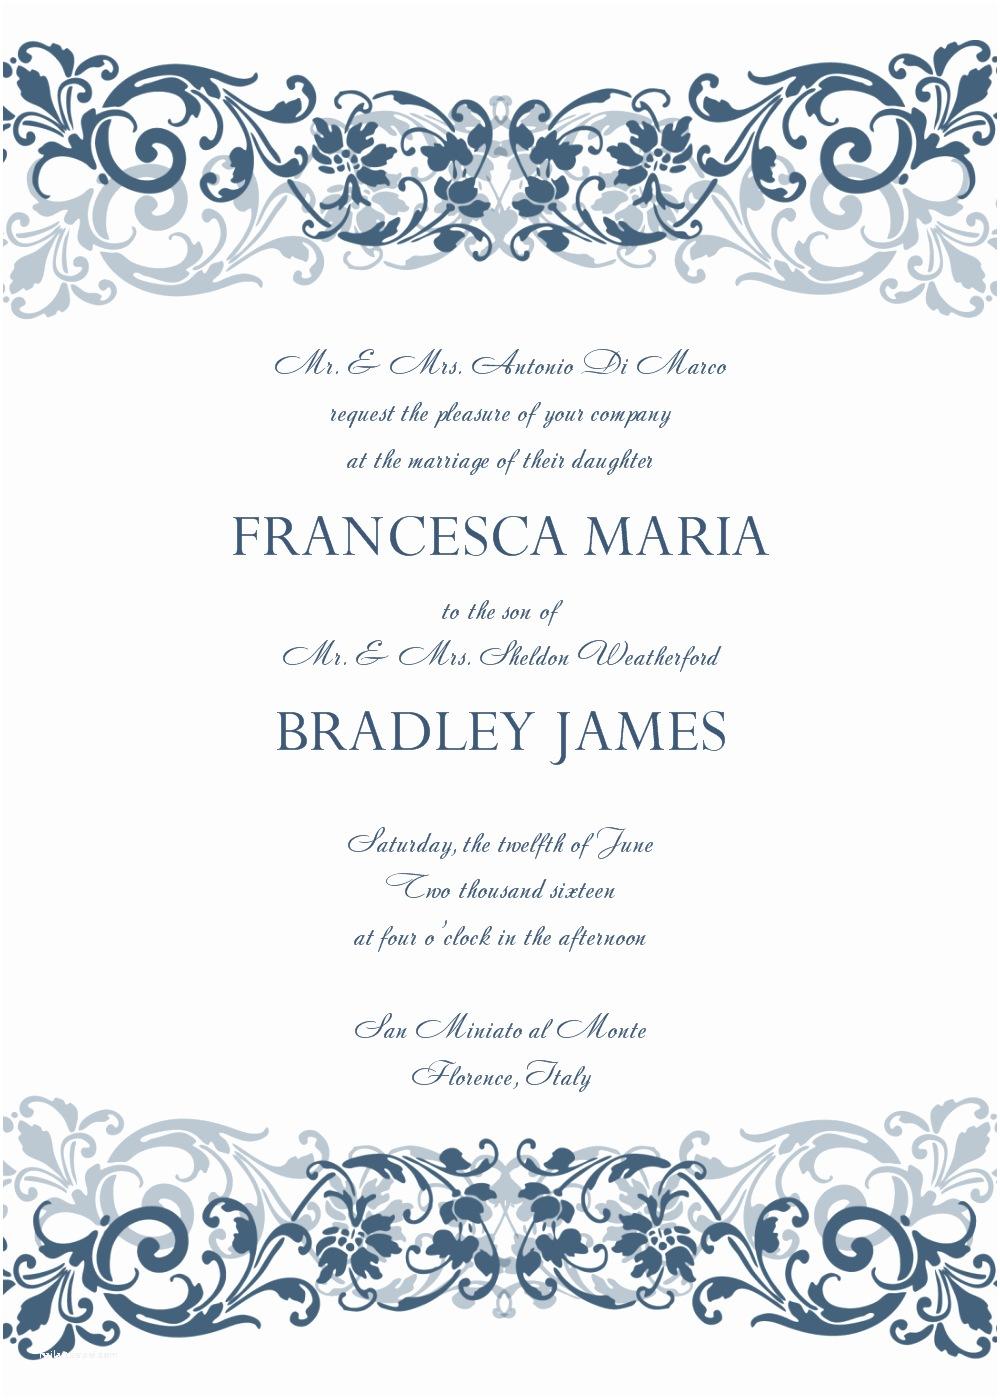 Free Printable Wedding Invitation Templates for Microsoft Word 8 Free Wedding Invitation Templates Excel Pdf formats